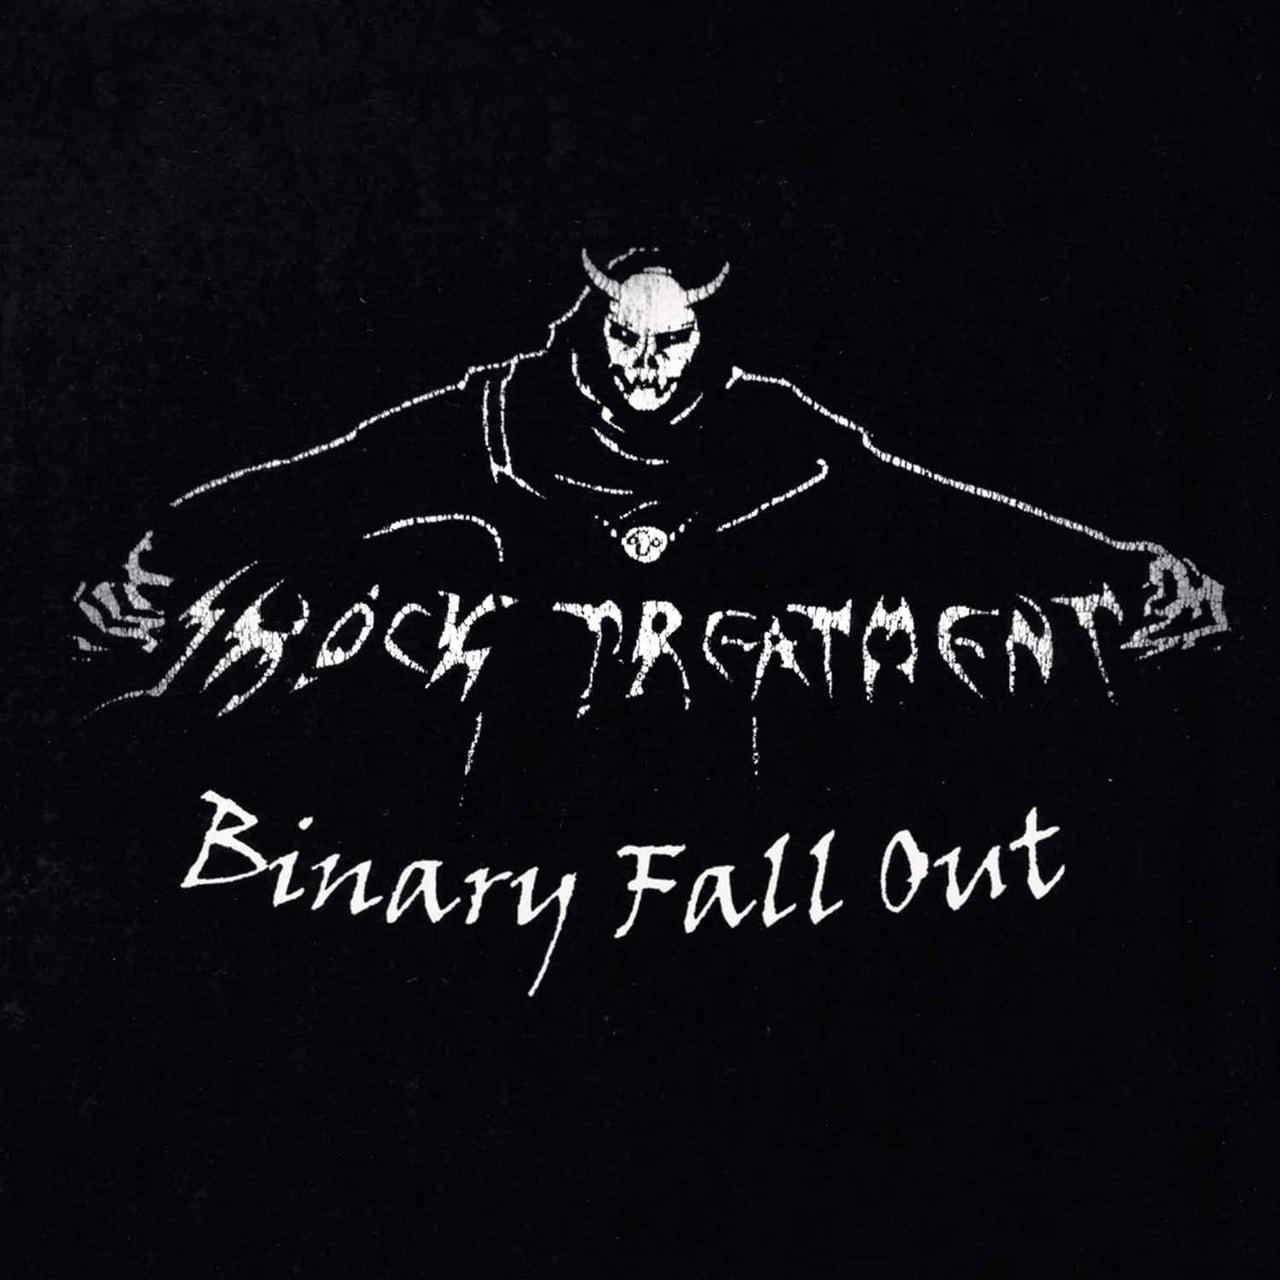 Binary Fall Out - 1